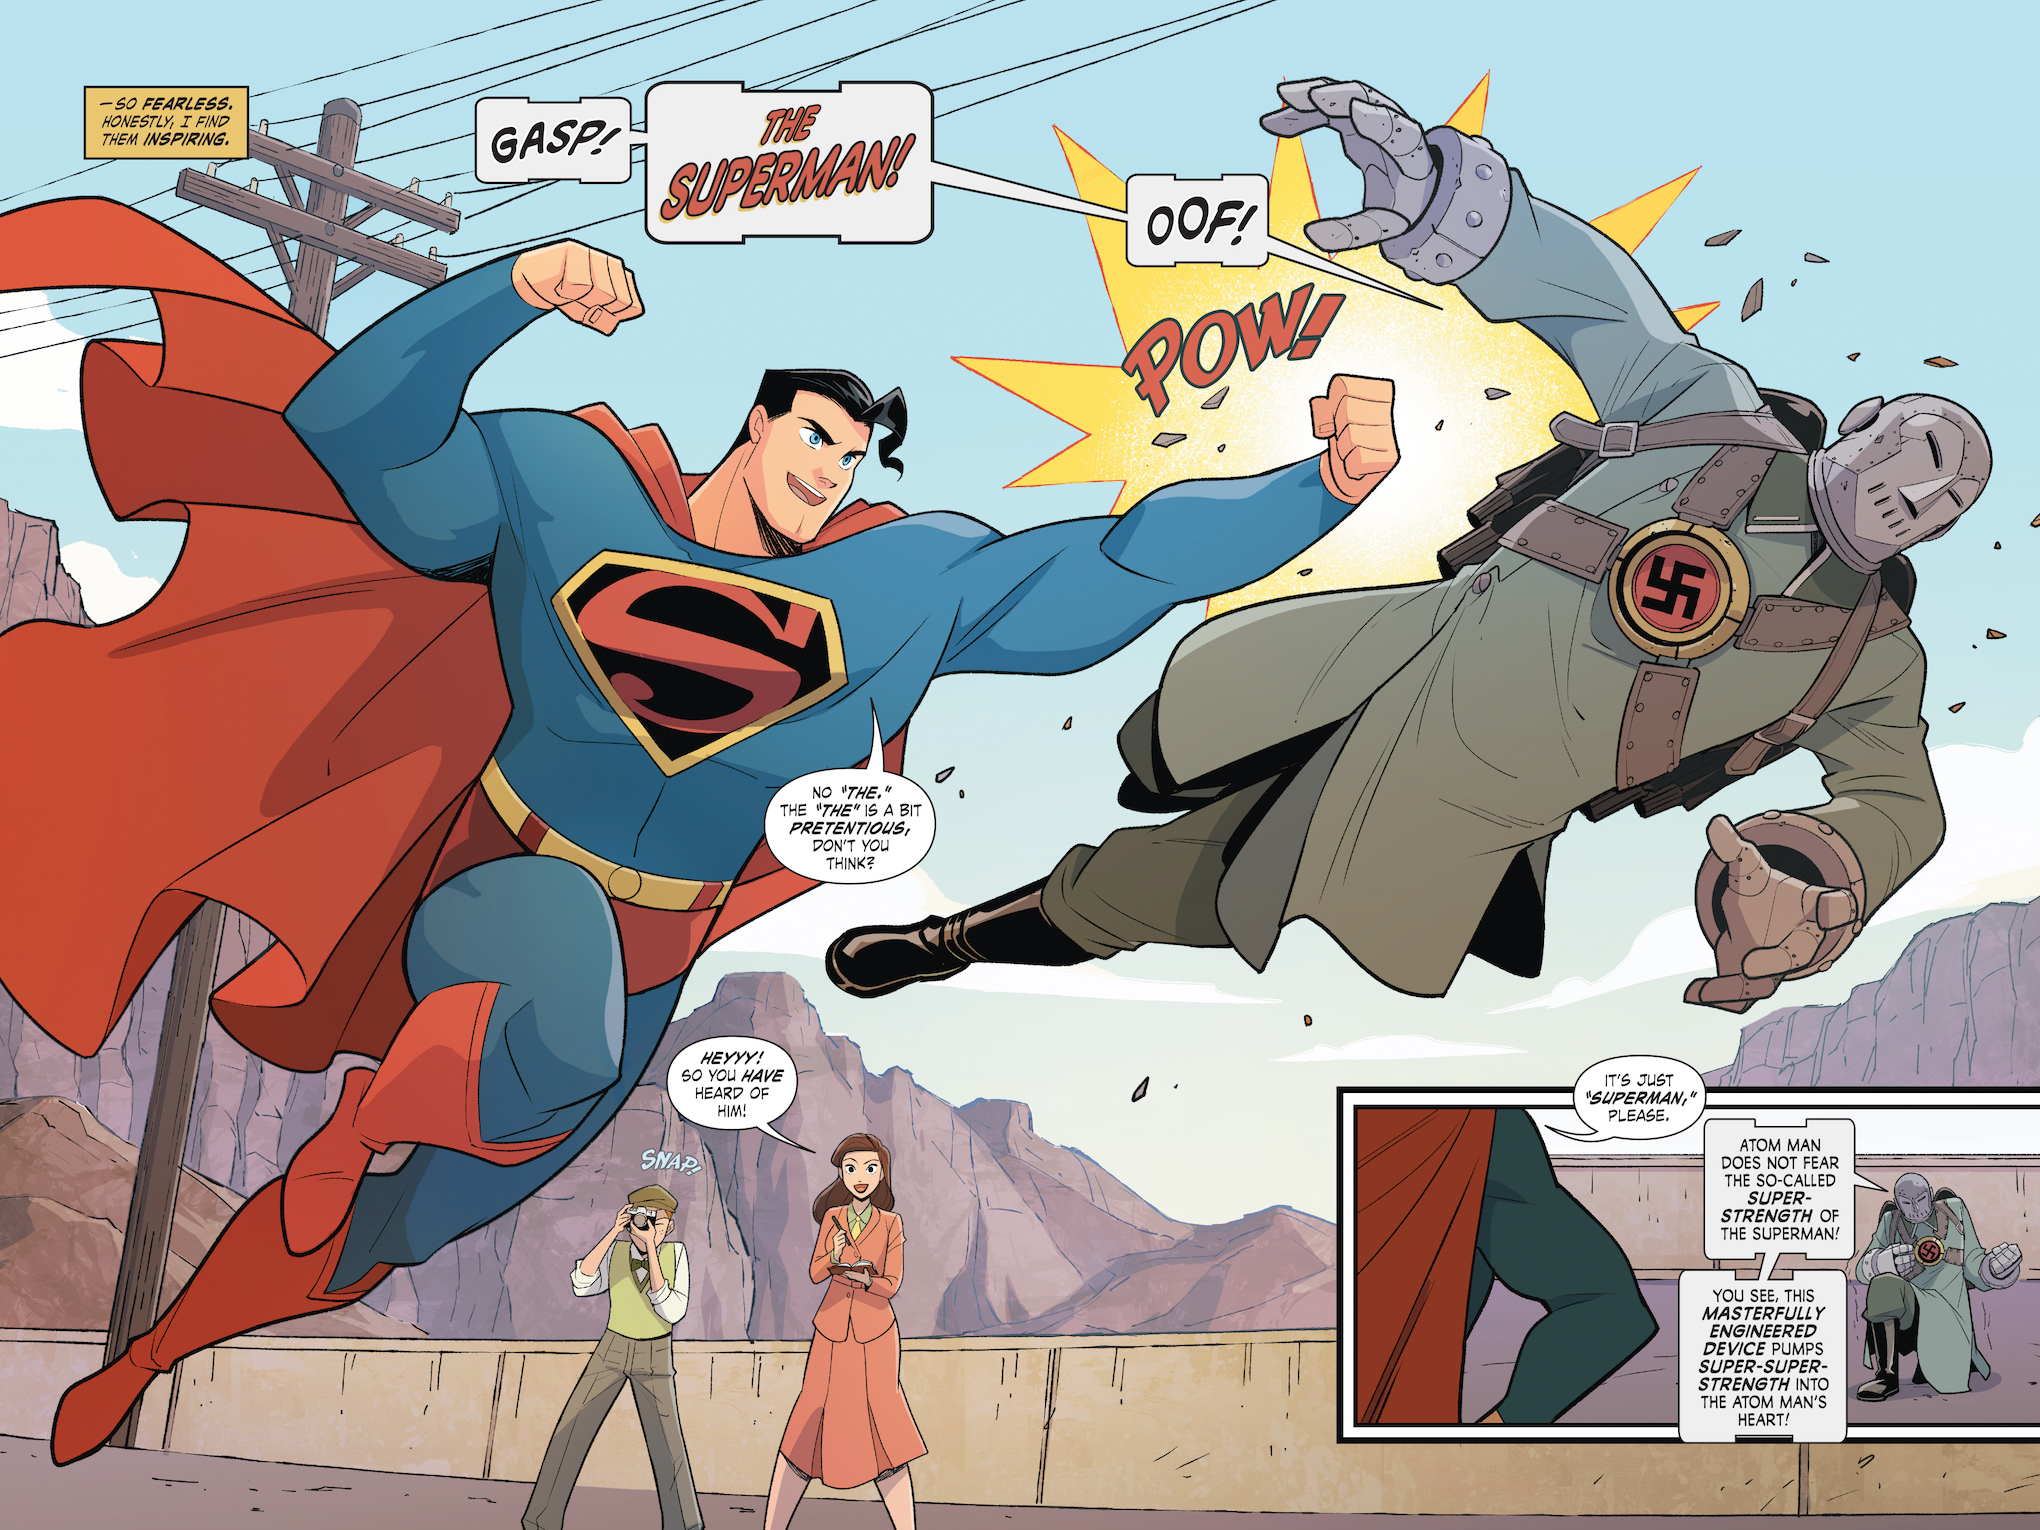 Superman punches the Atom Man, a neo-nazi terrorist, in Superman Smashes the Klan #1, DC Comics (2019).